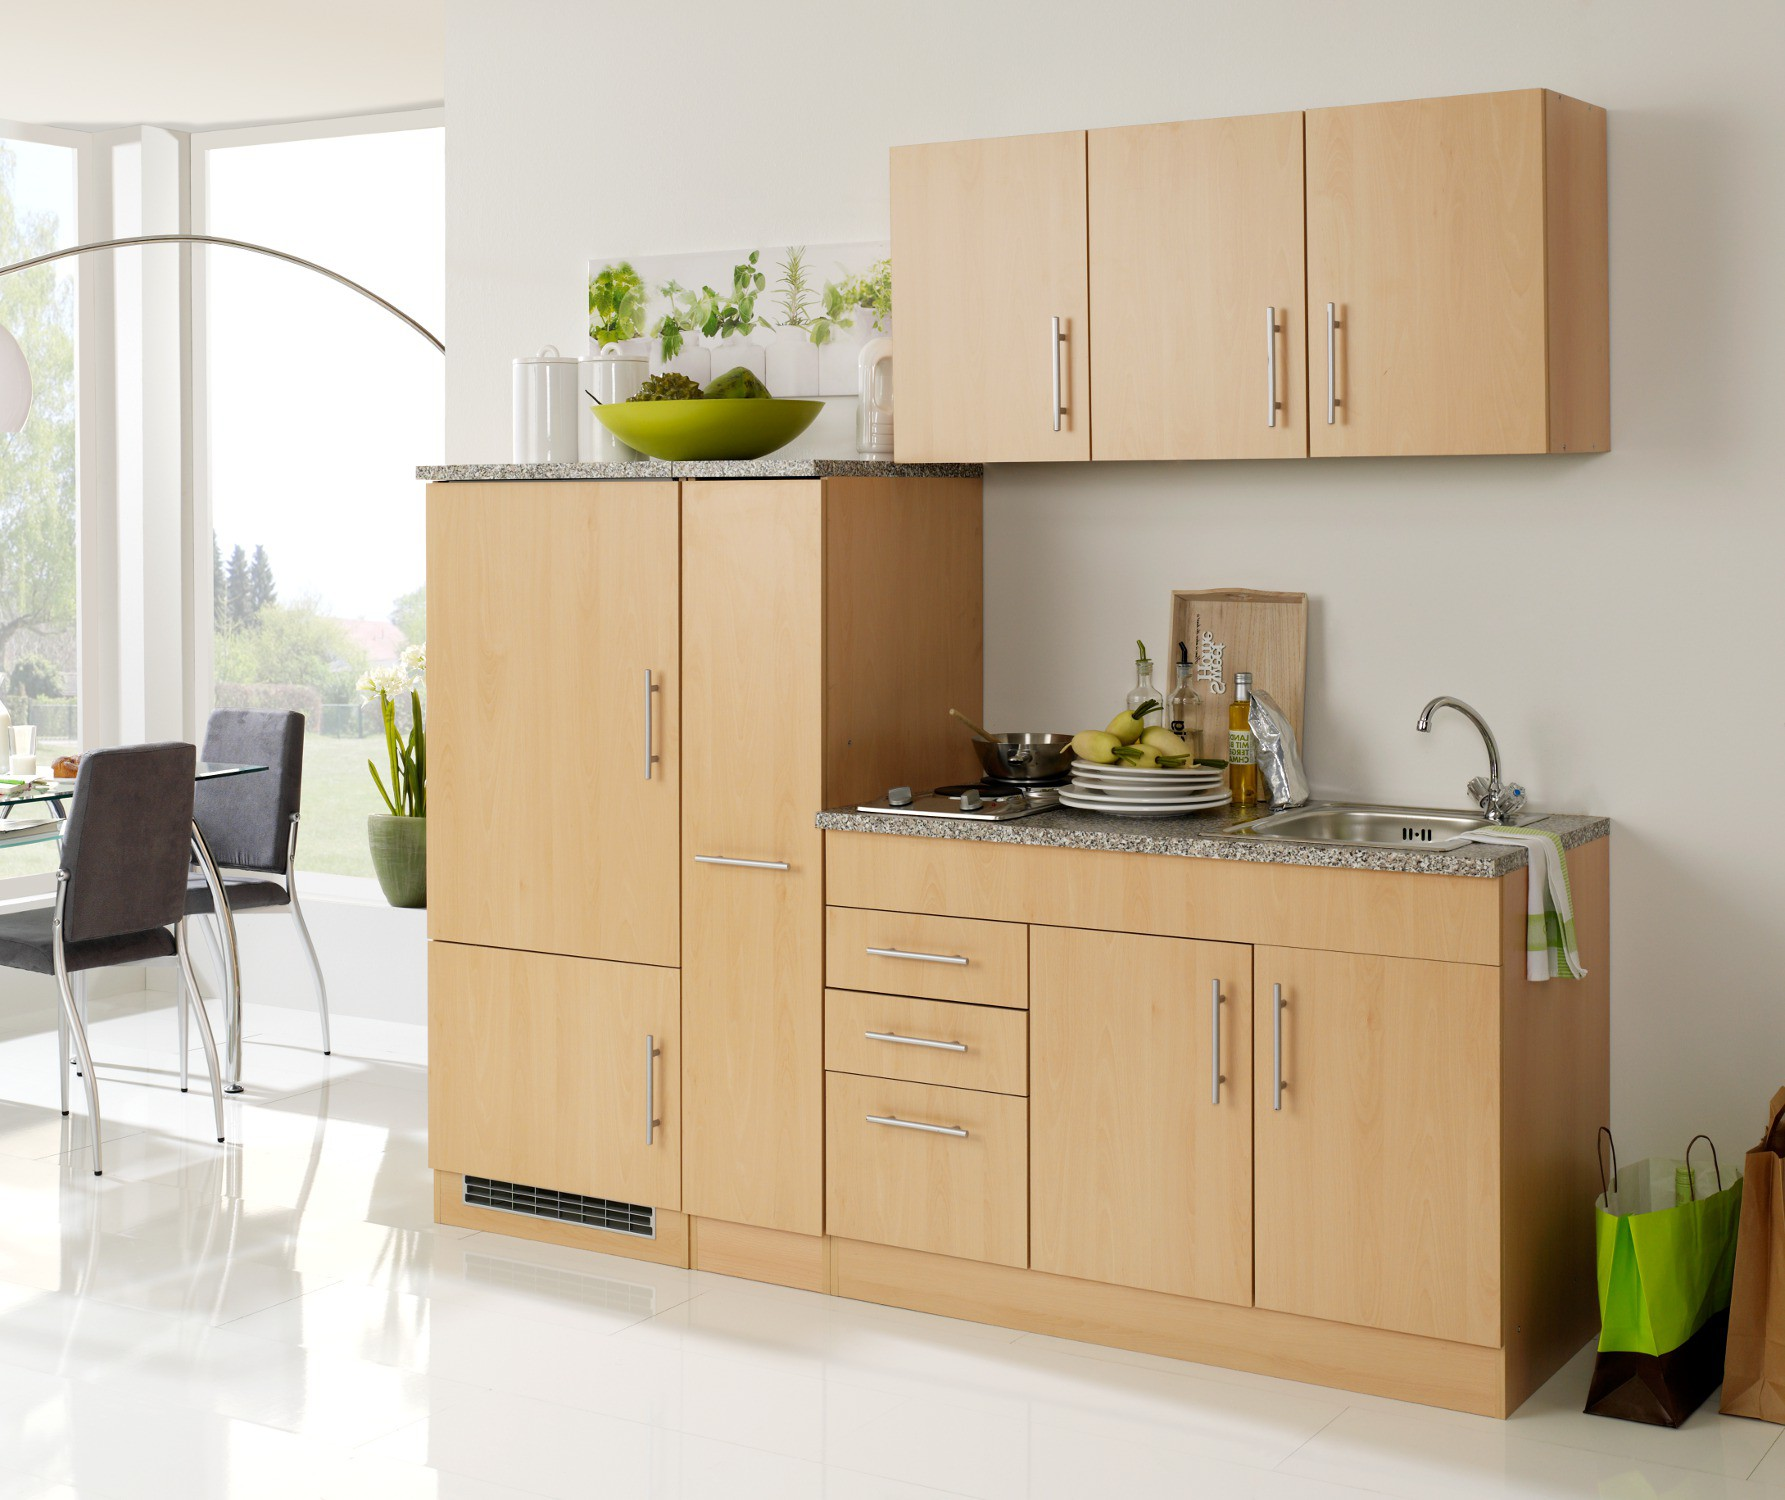 singlek che berlin breite 210 cm buche k che singlek chen. Black Bedroom Furniture Sets. Home Design Ideas